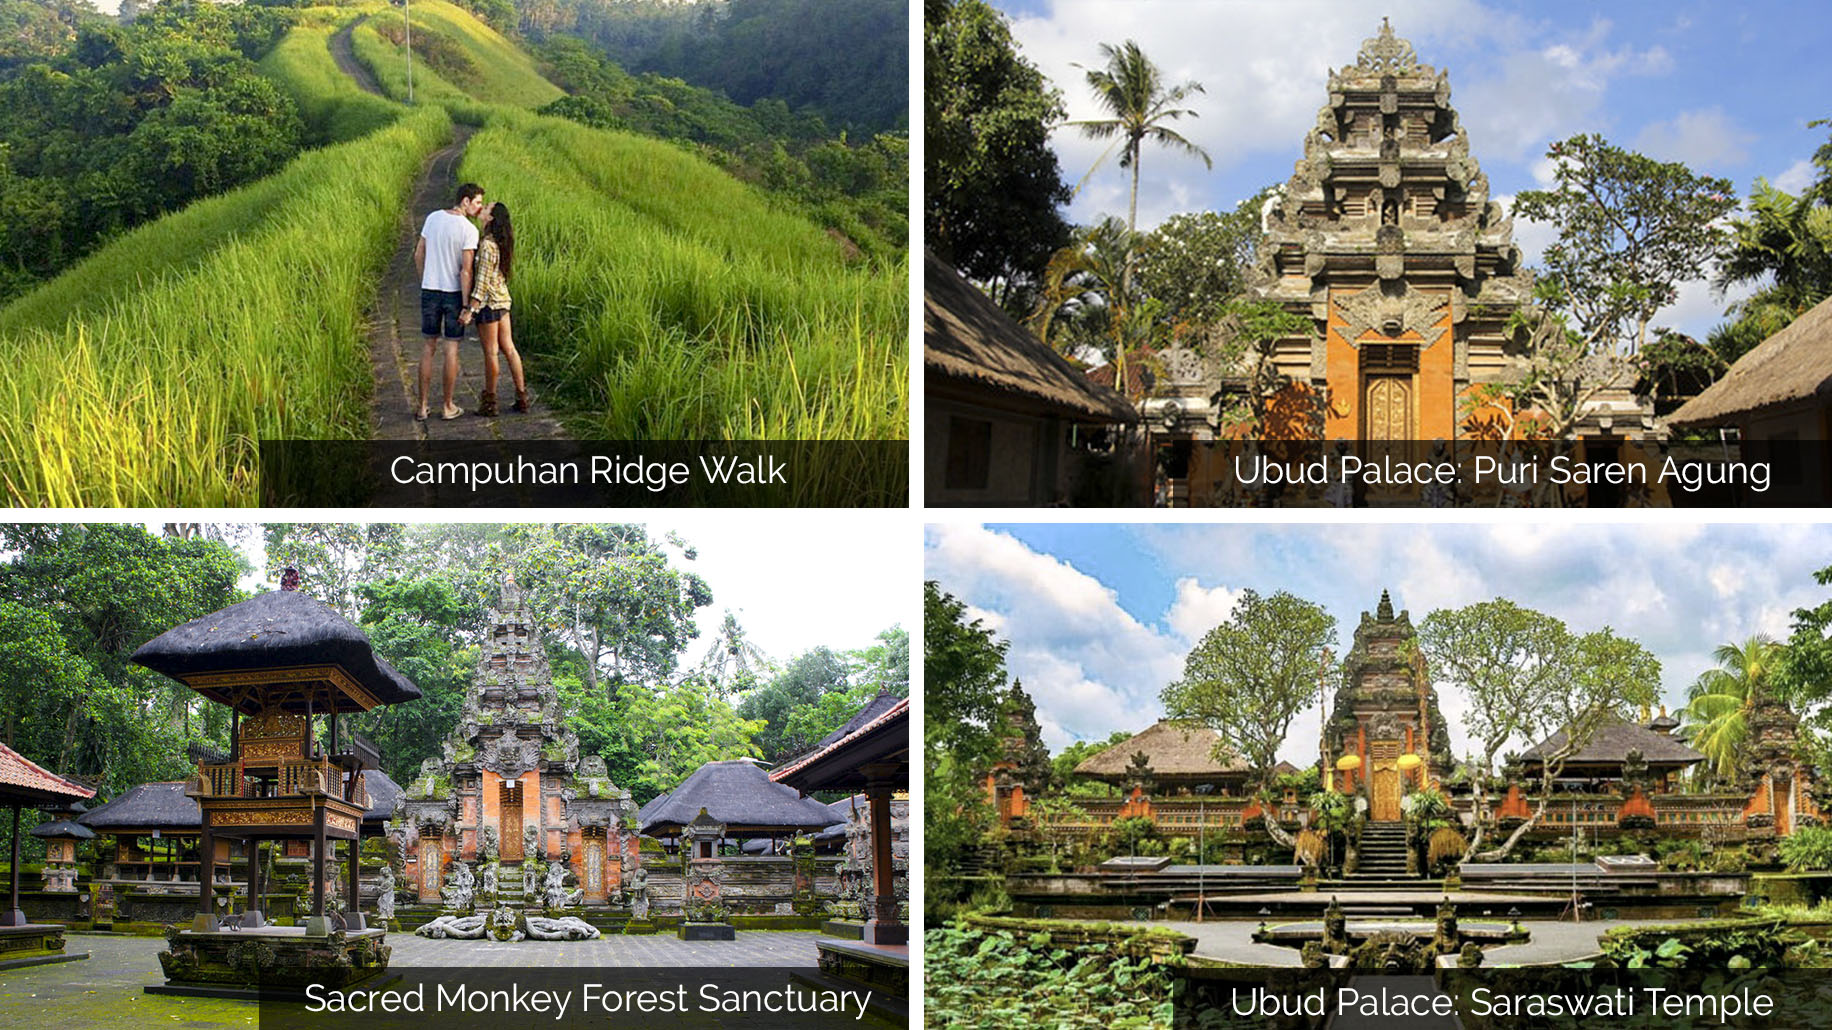 Ubud Center- du lịch Bali ngaylangthang